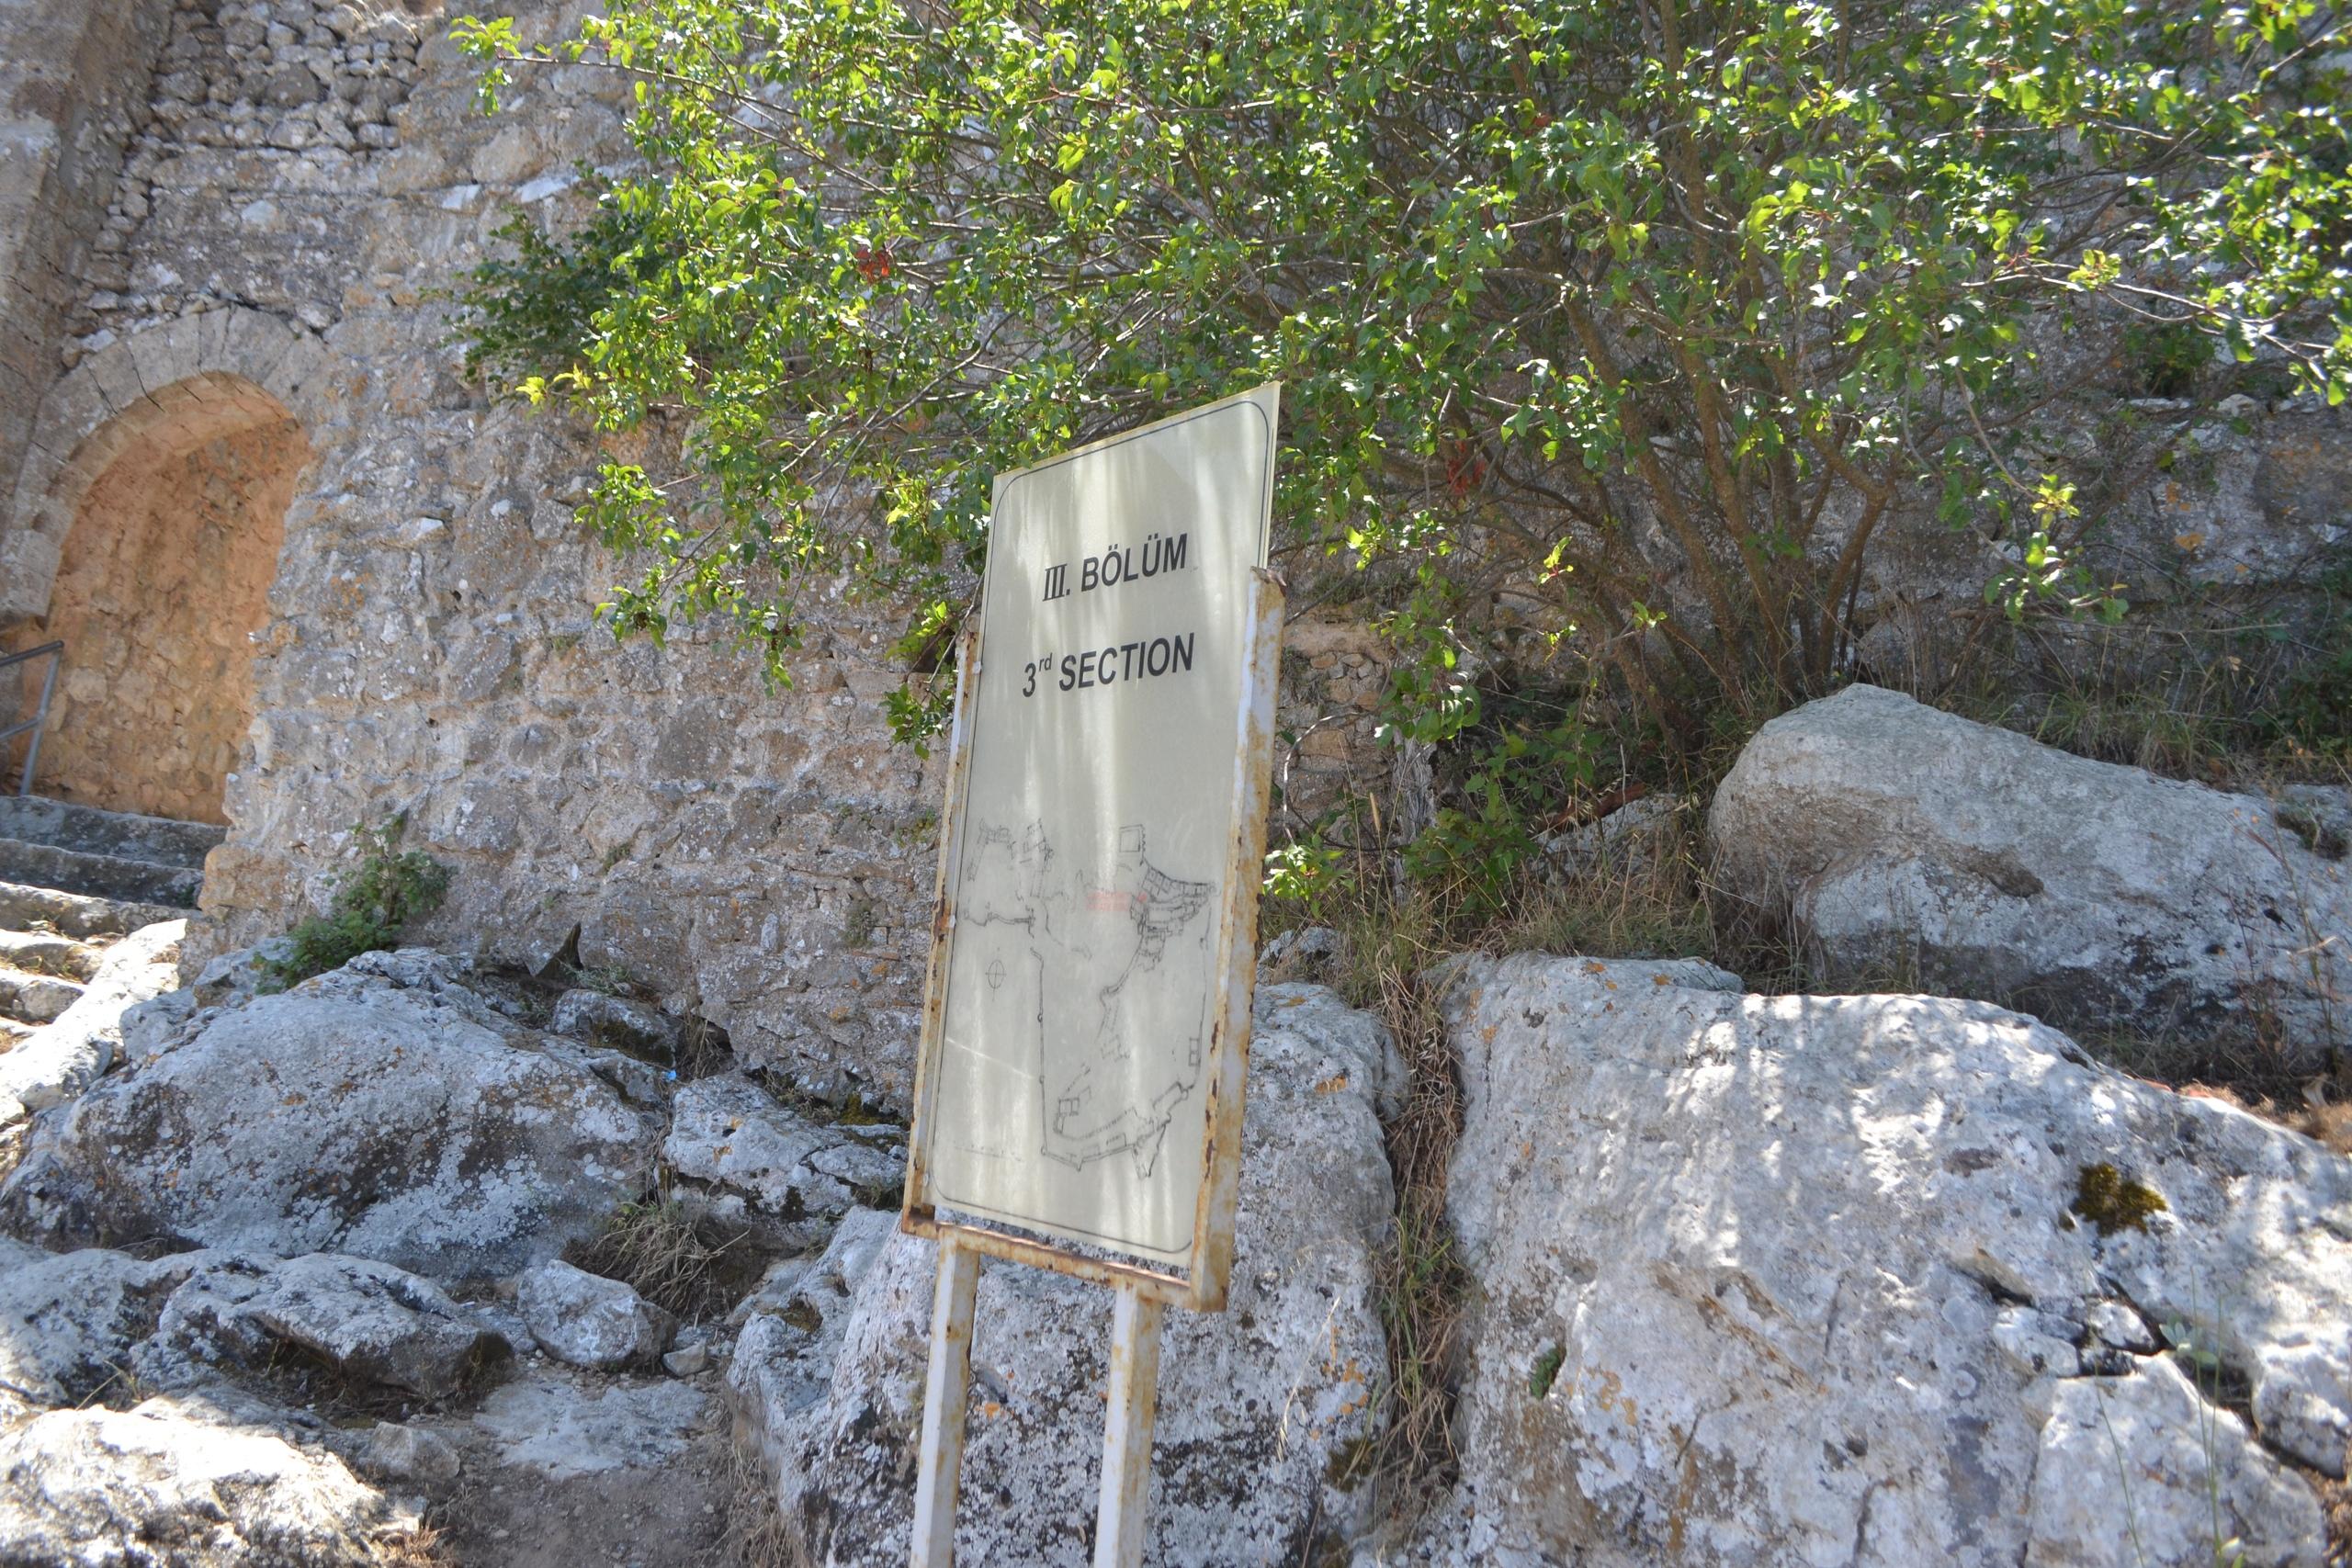 Северный Кипр. Замок Святого Иллариона. (фото). - Страница 2 NxgmWqjLjPY